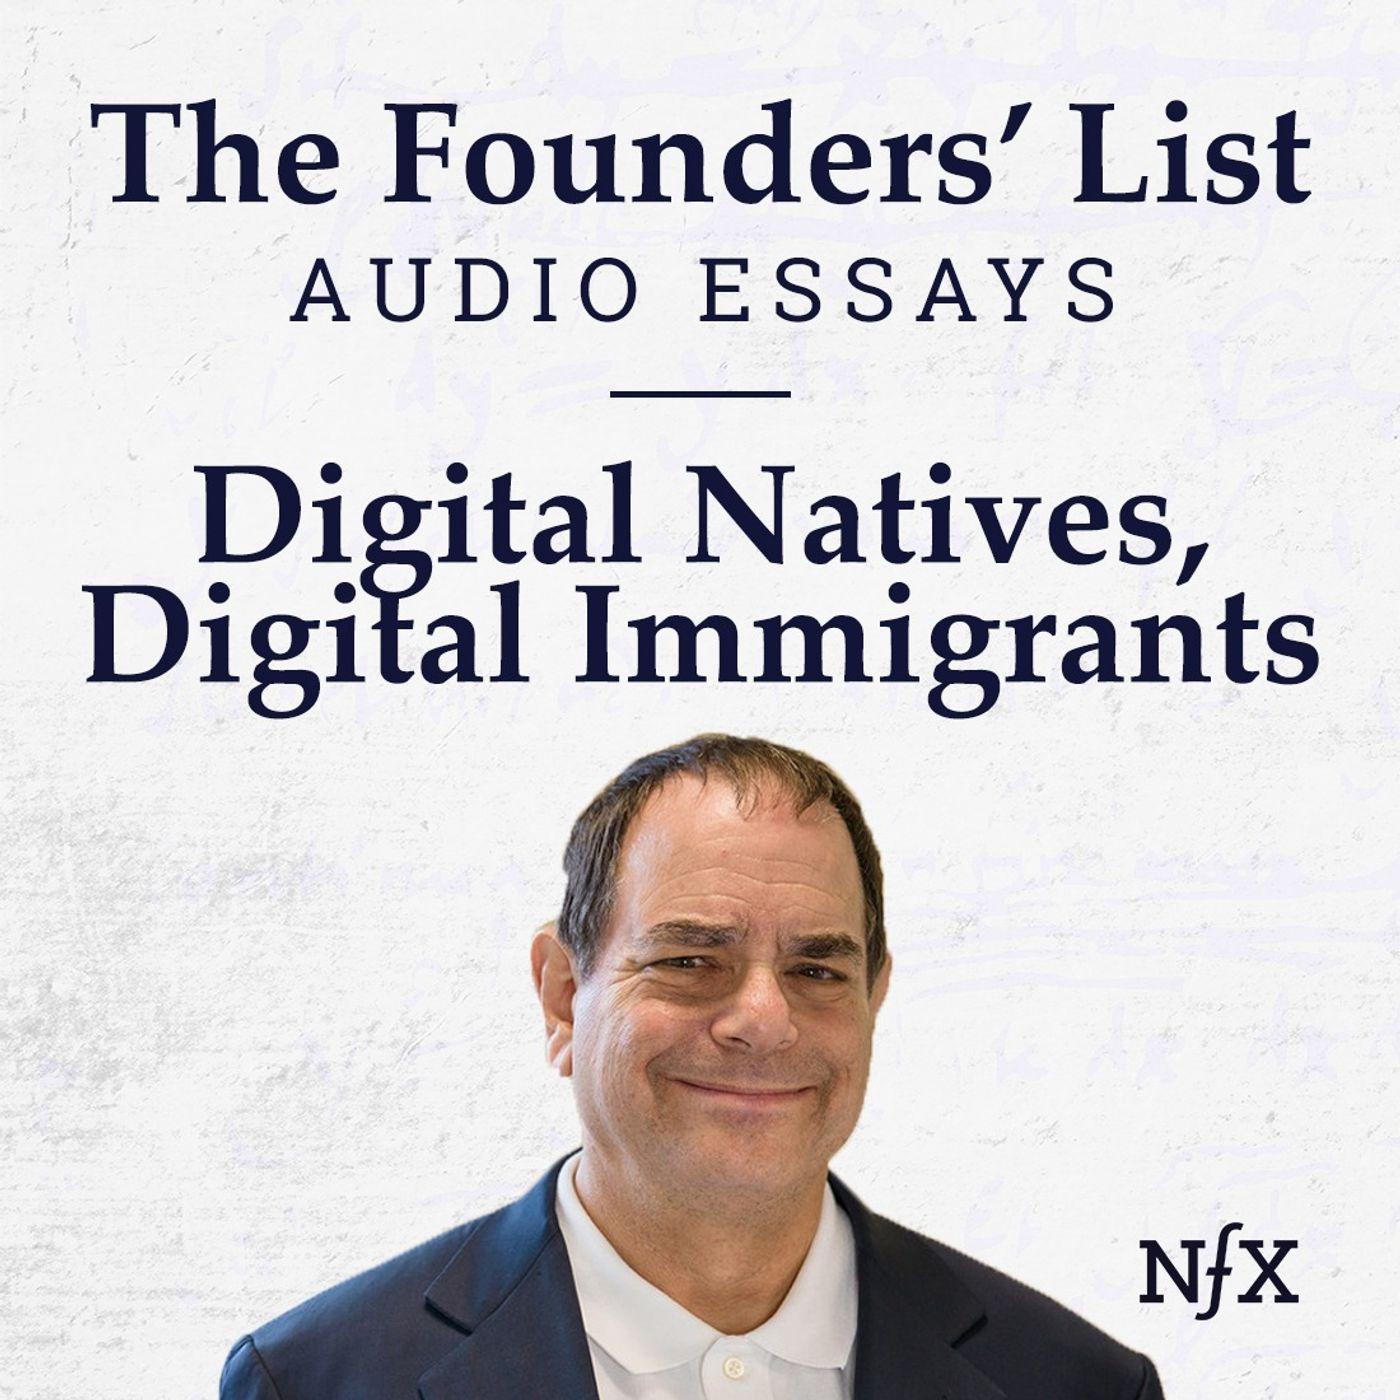 The Founders' List: Digital Natives, Digital Immigrants from Marc Prensky